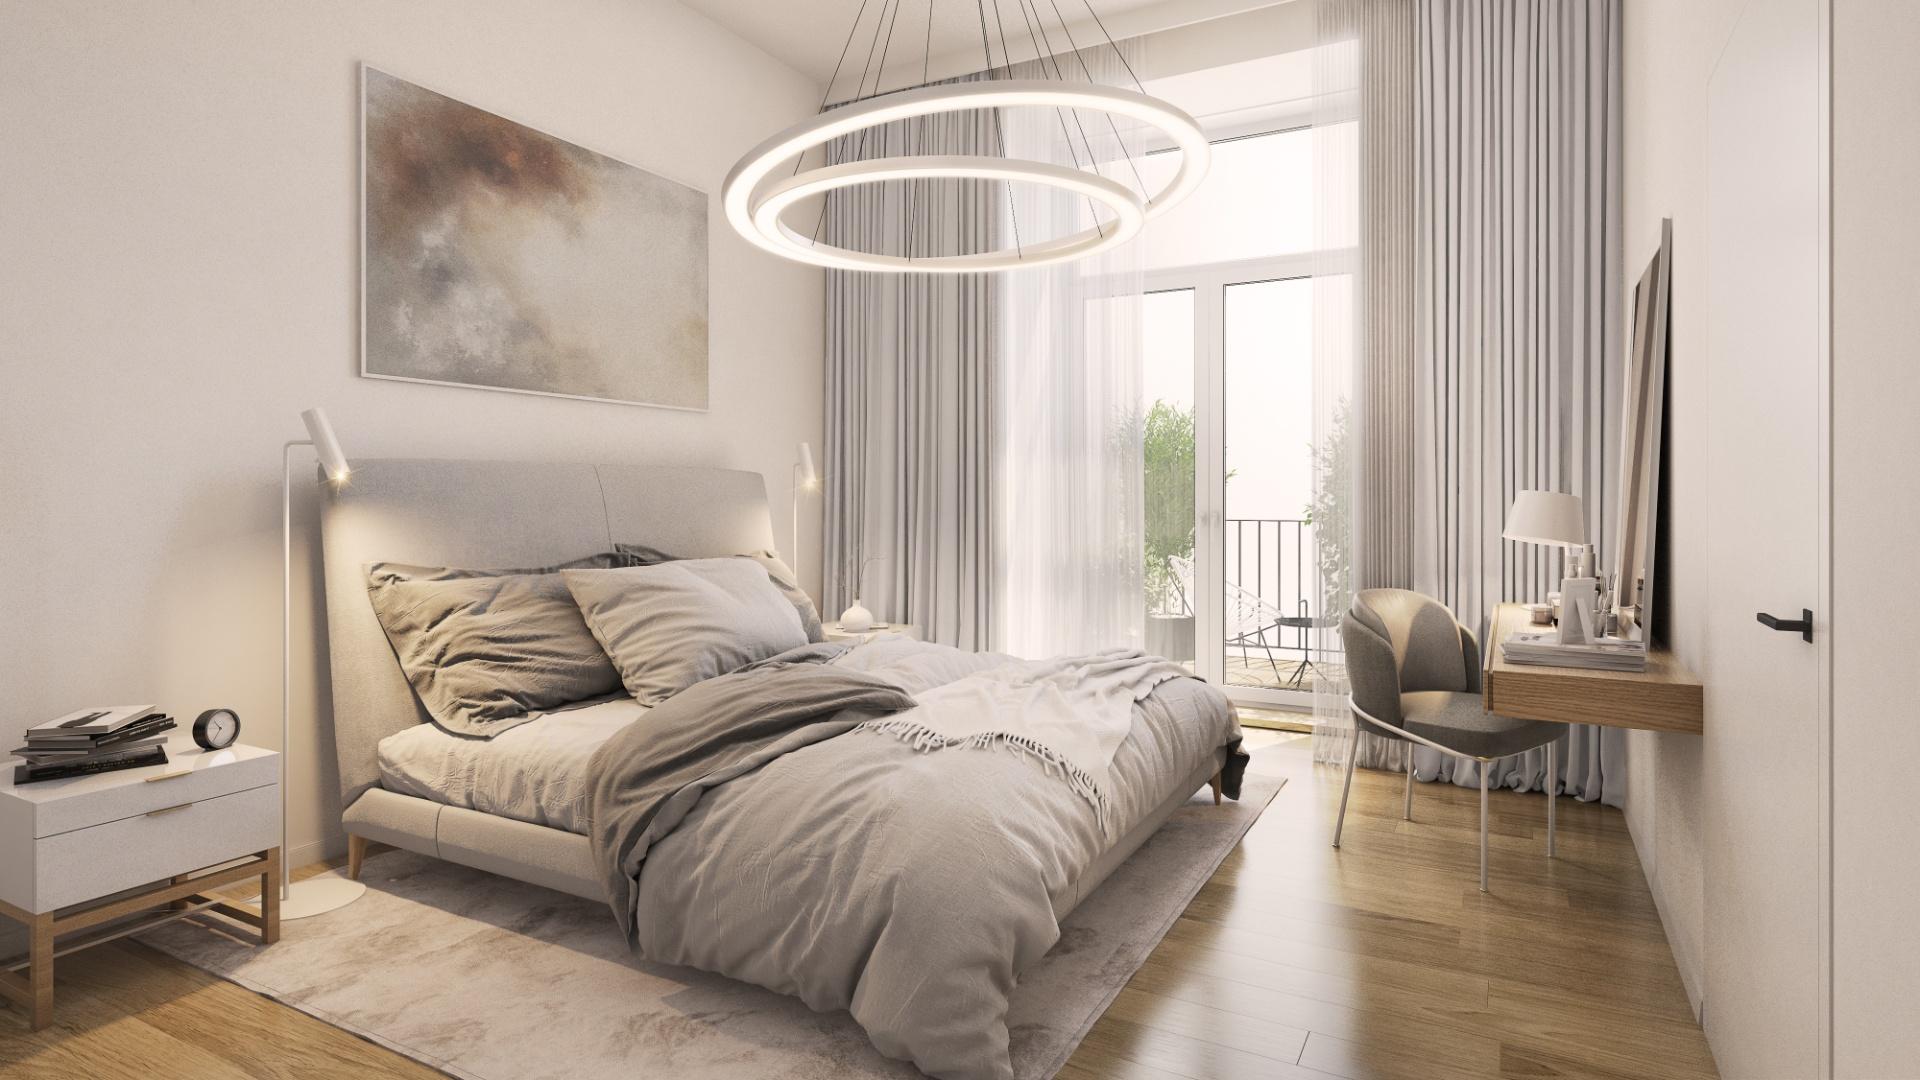 foto byt ložnice